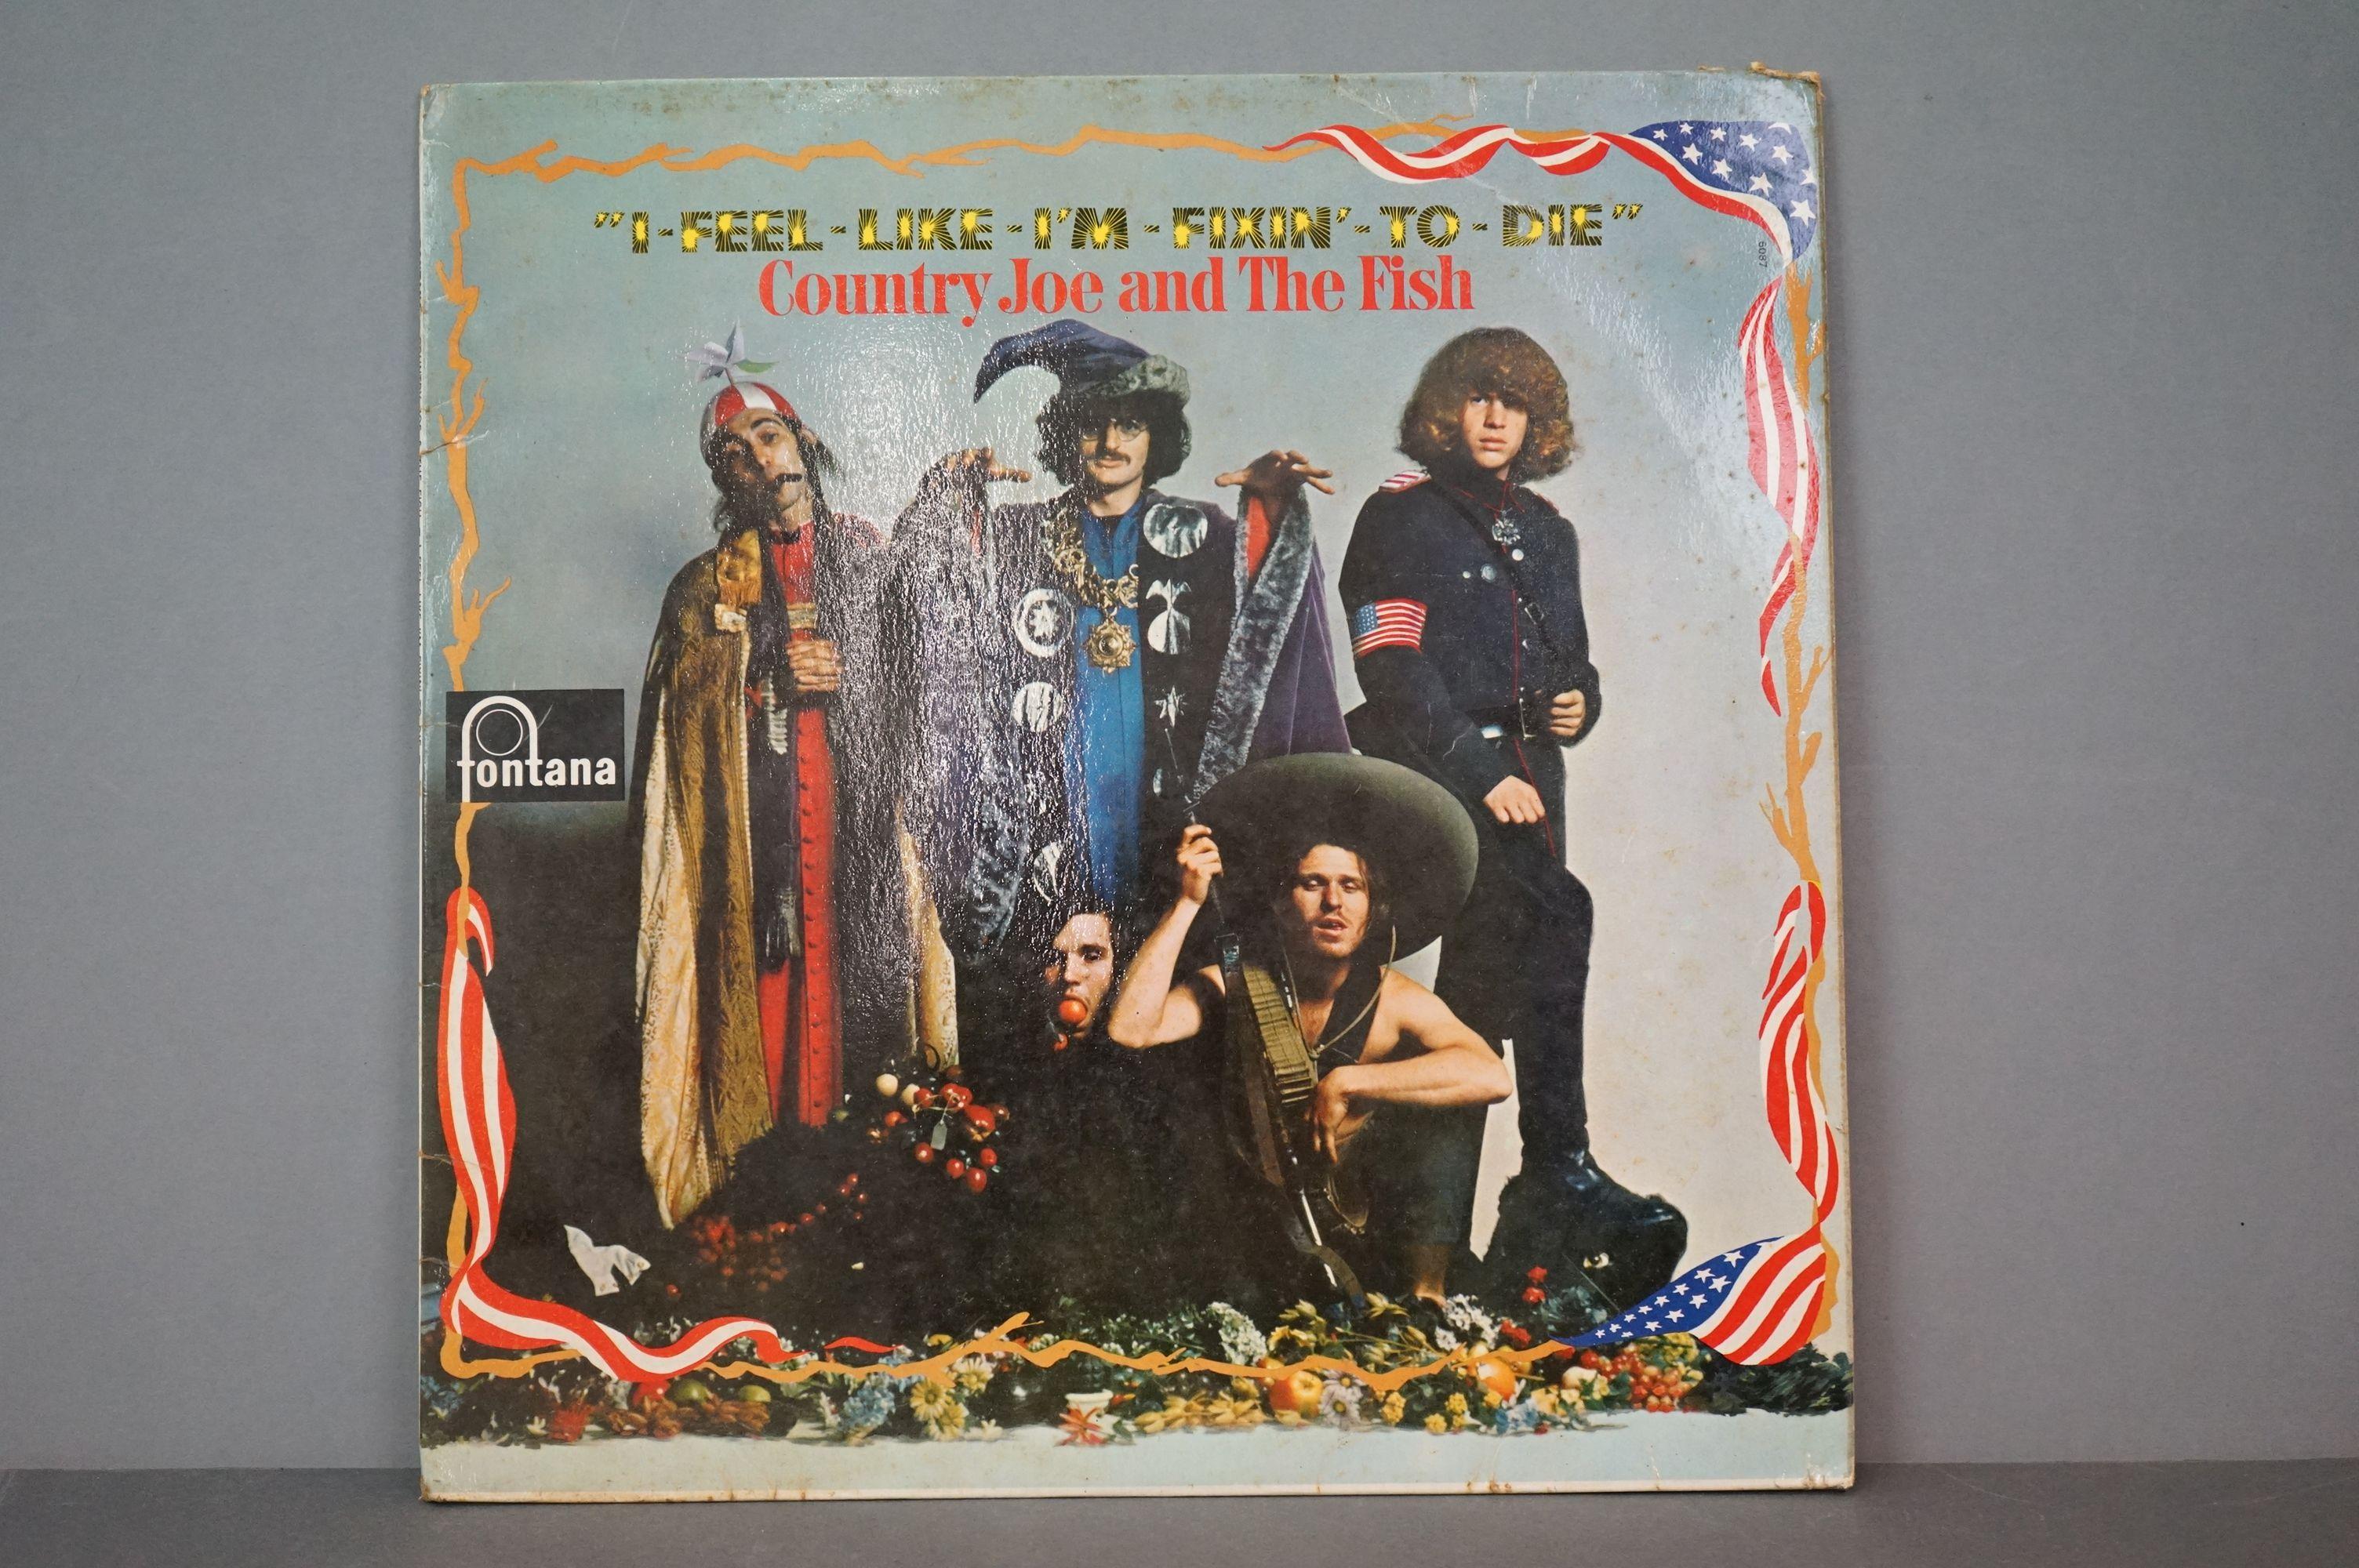 Vinyl - Country Joe and The Fish, I Feel Like I'm Fixin' To Die, Fontana STFL 6087, flip back